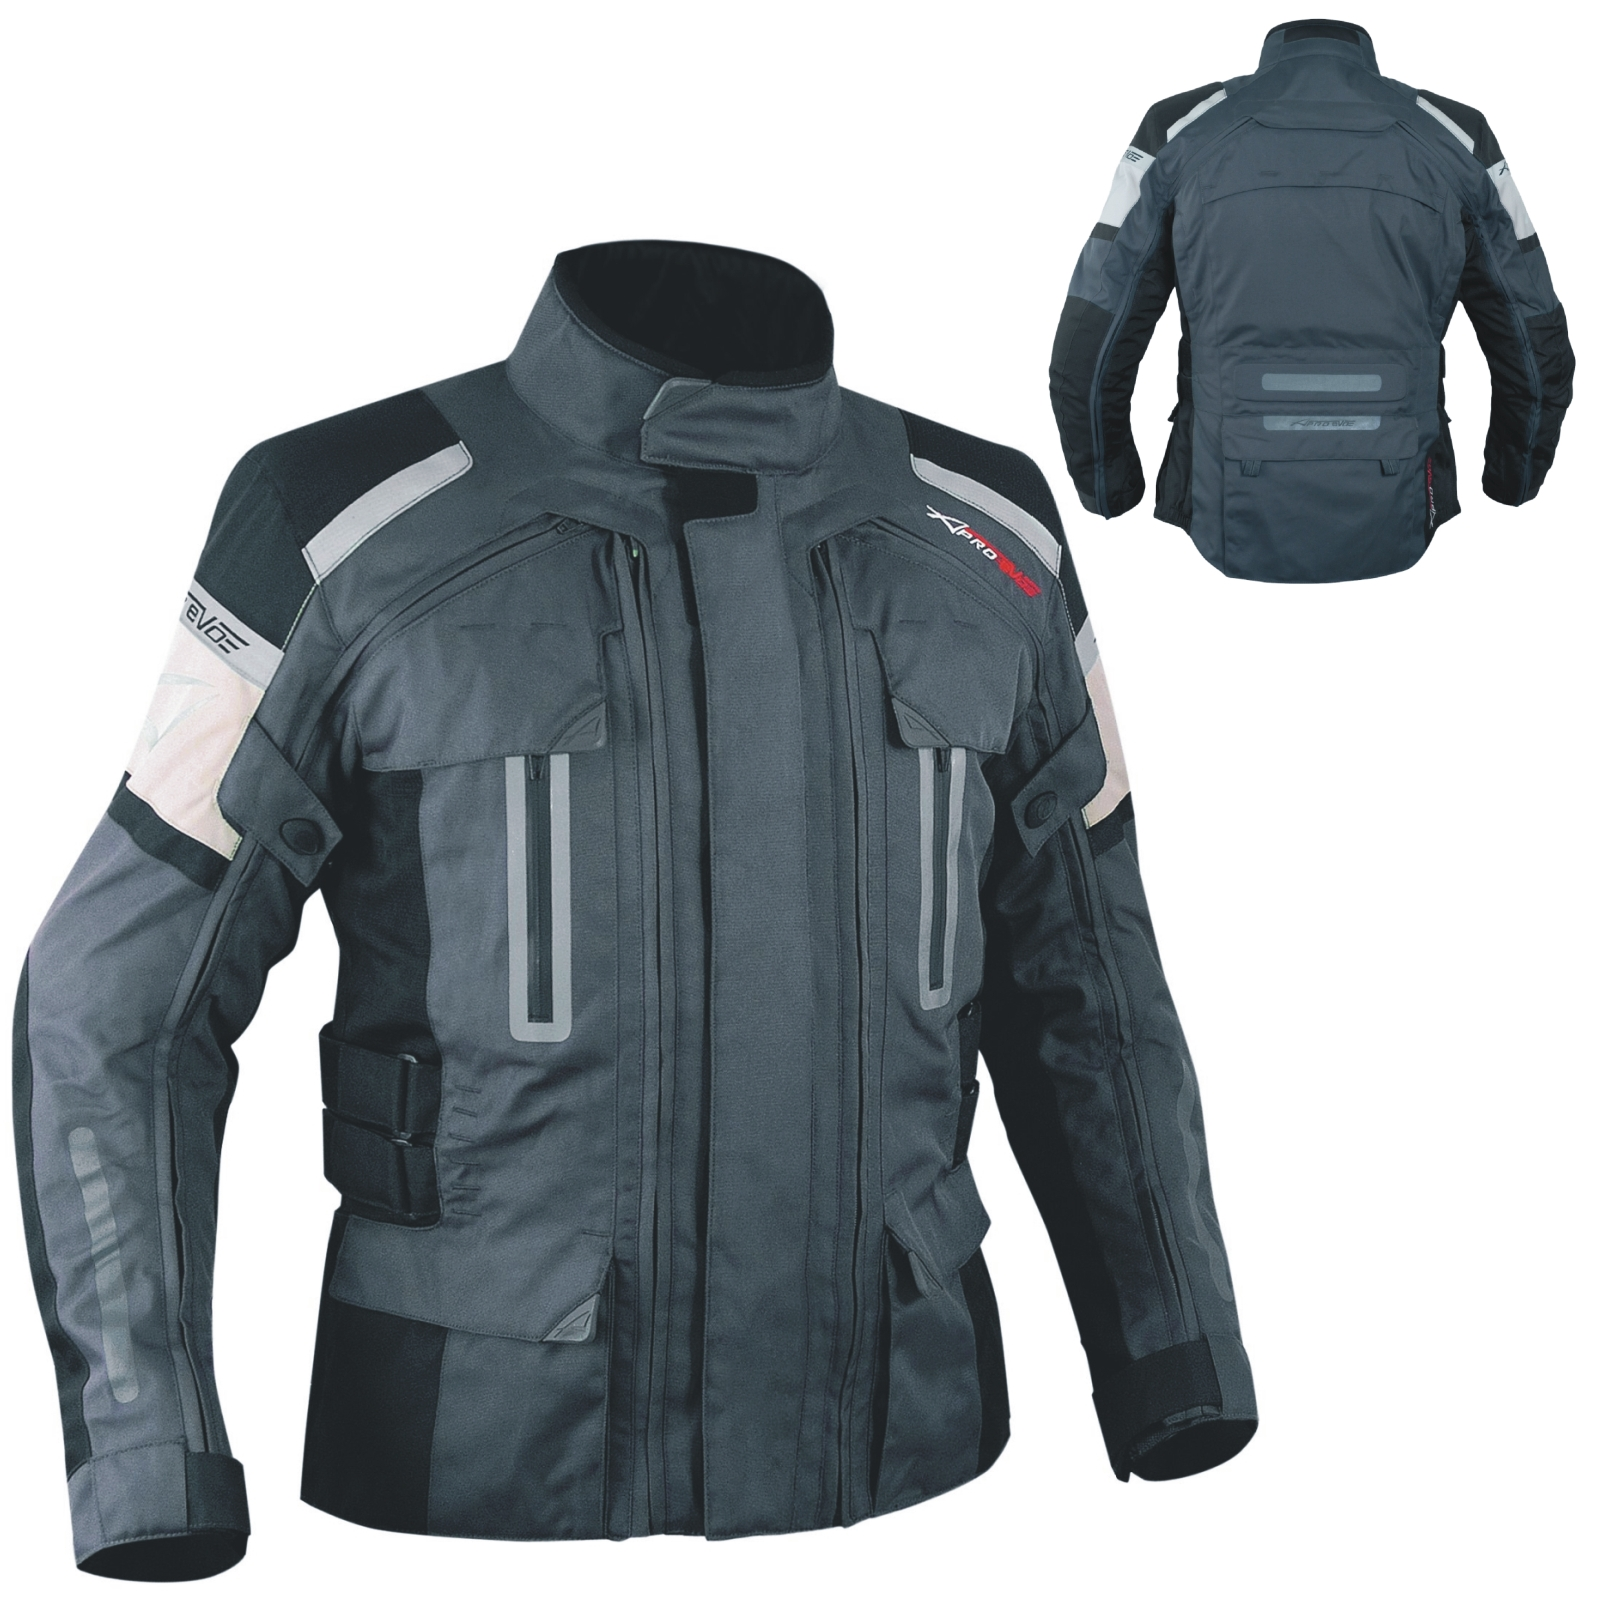 4-Capas-4-Seasons-chaqueta-desmontable-termica-impermeable-Moto-BMW